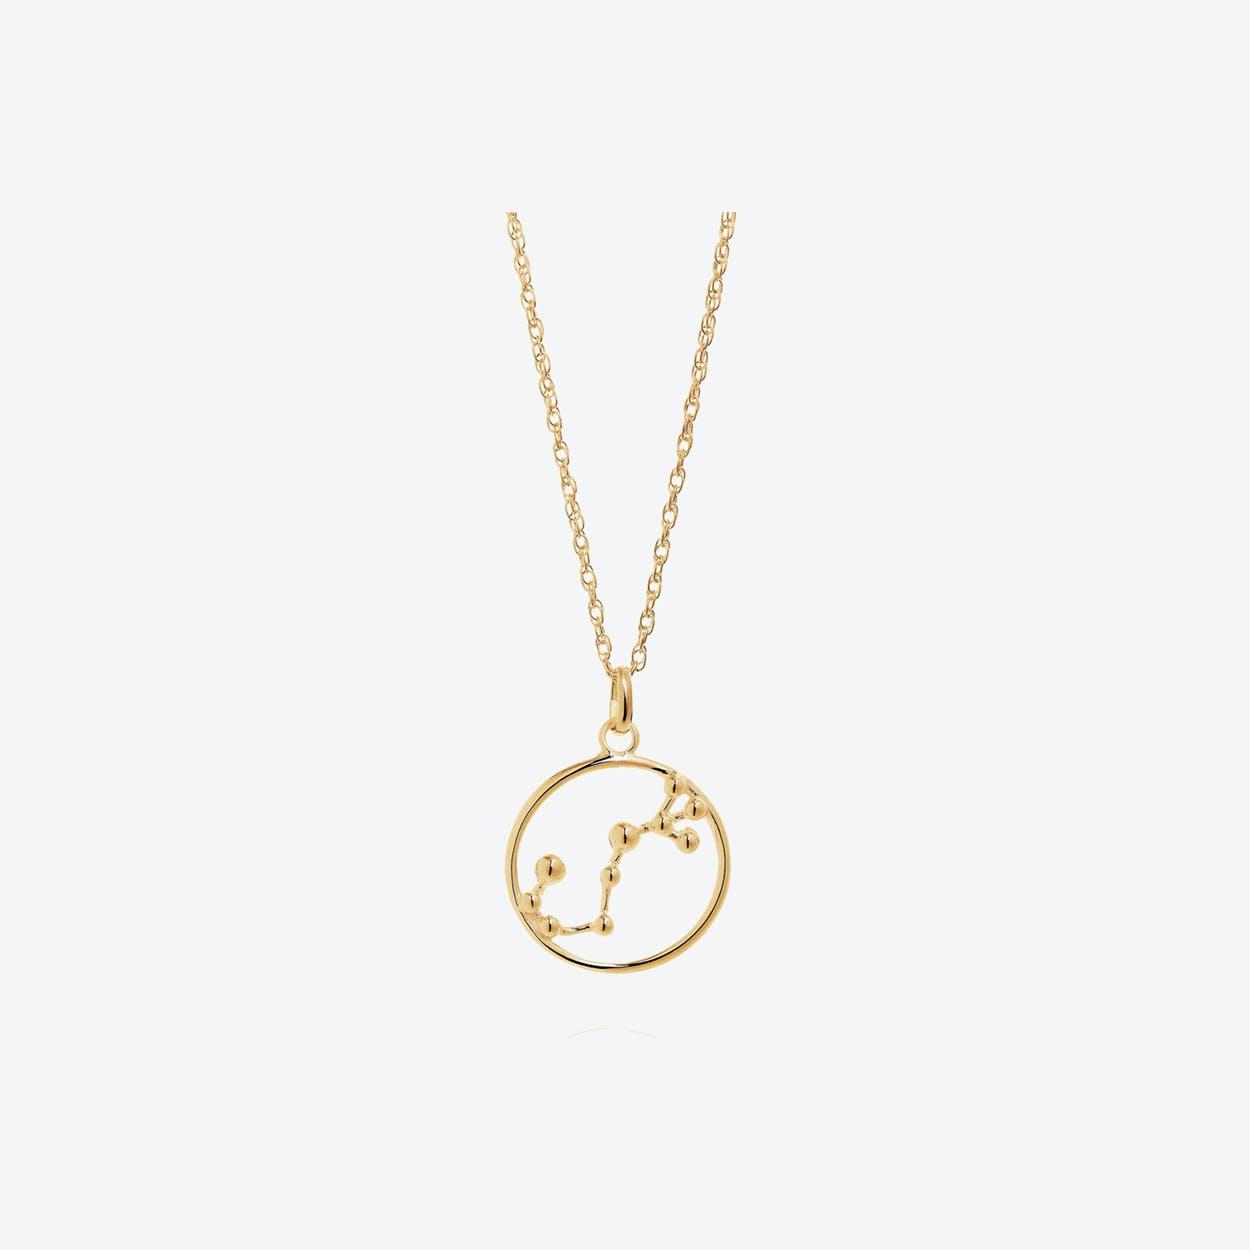 Gold Scorpio Astrology Necklace By Yasmin Everley Jewellery Fy